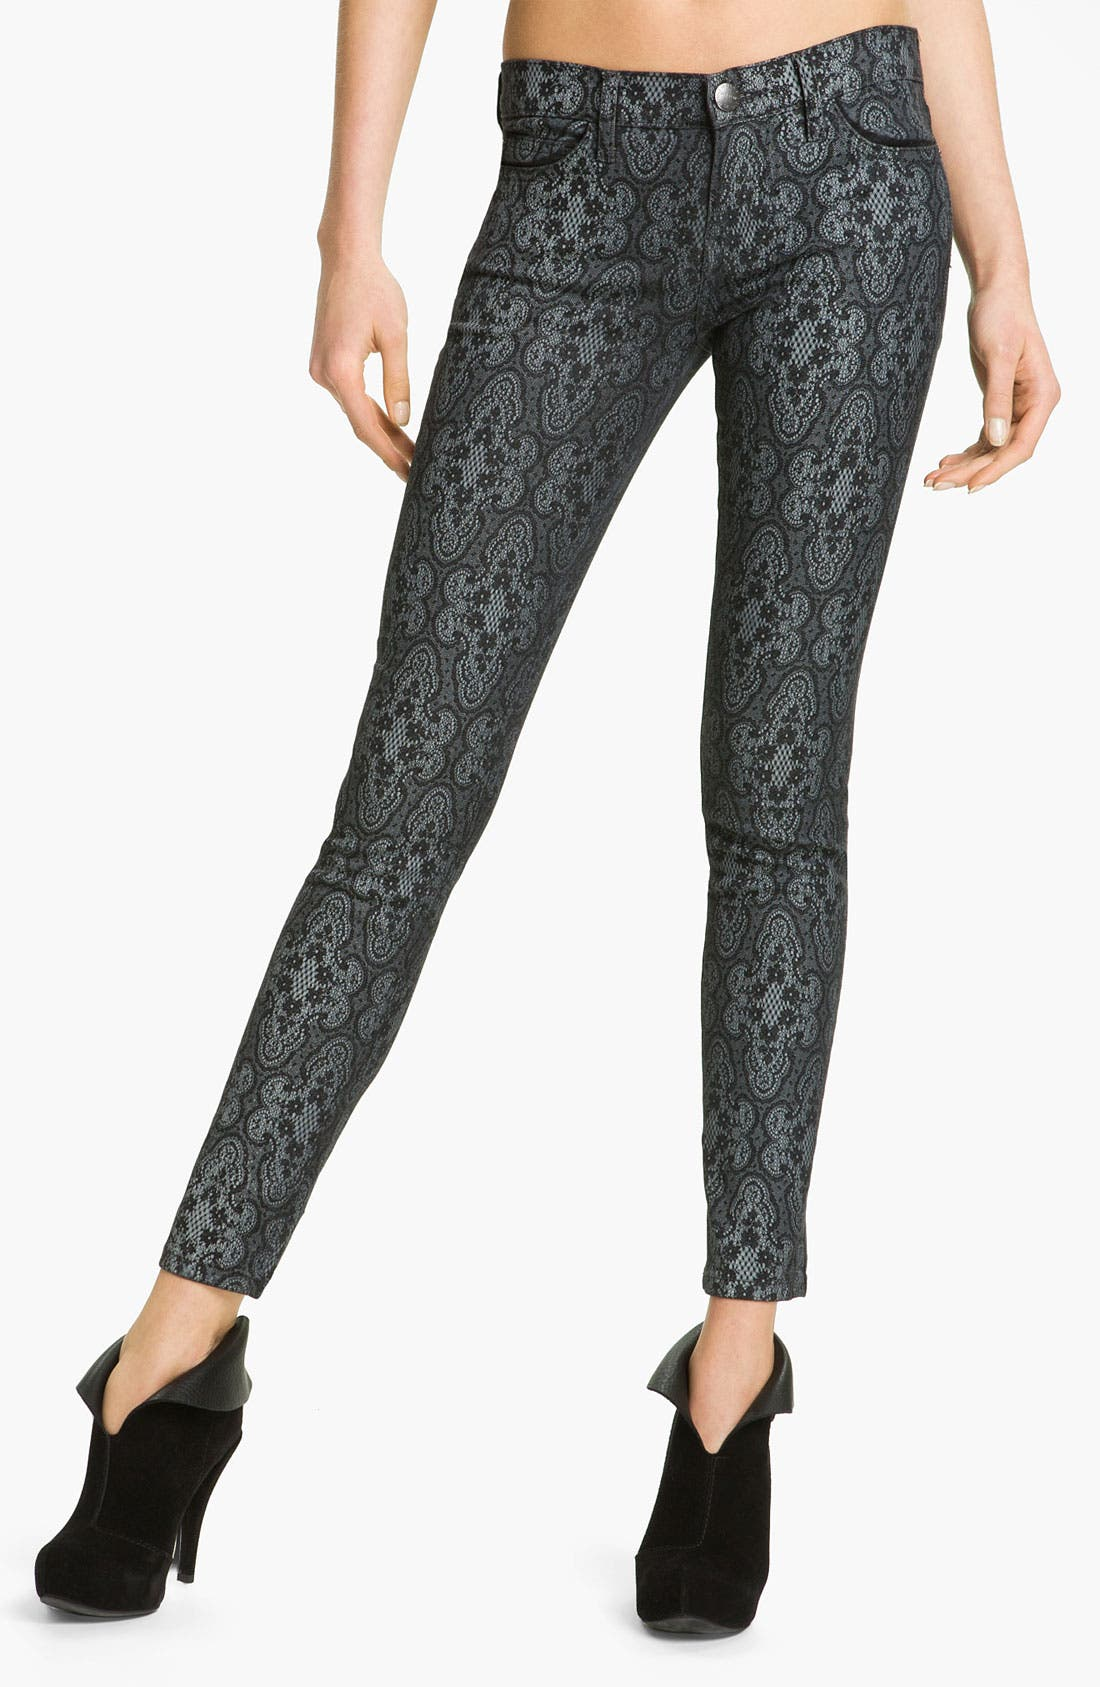 Main Image - Current/Elliott Print Stretch Skinny Jeans (Black Antique)